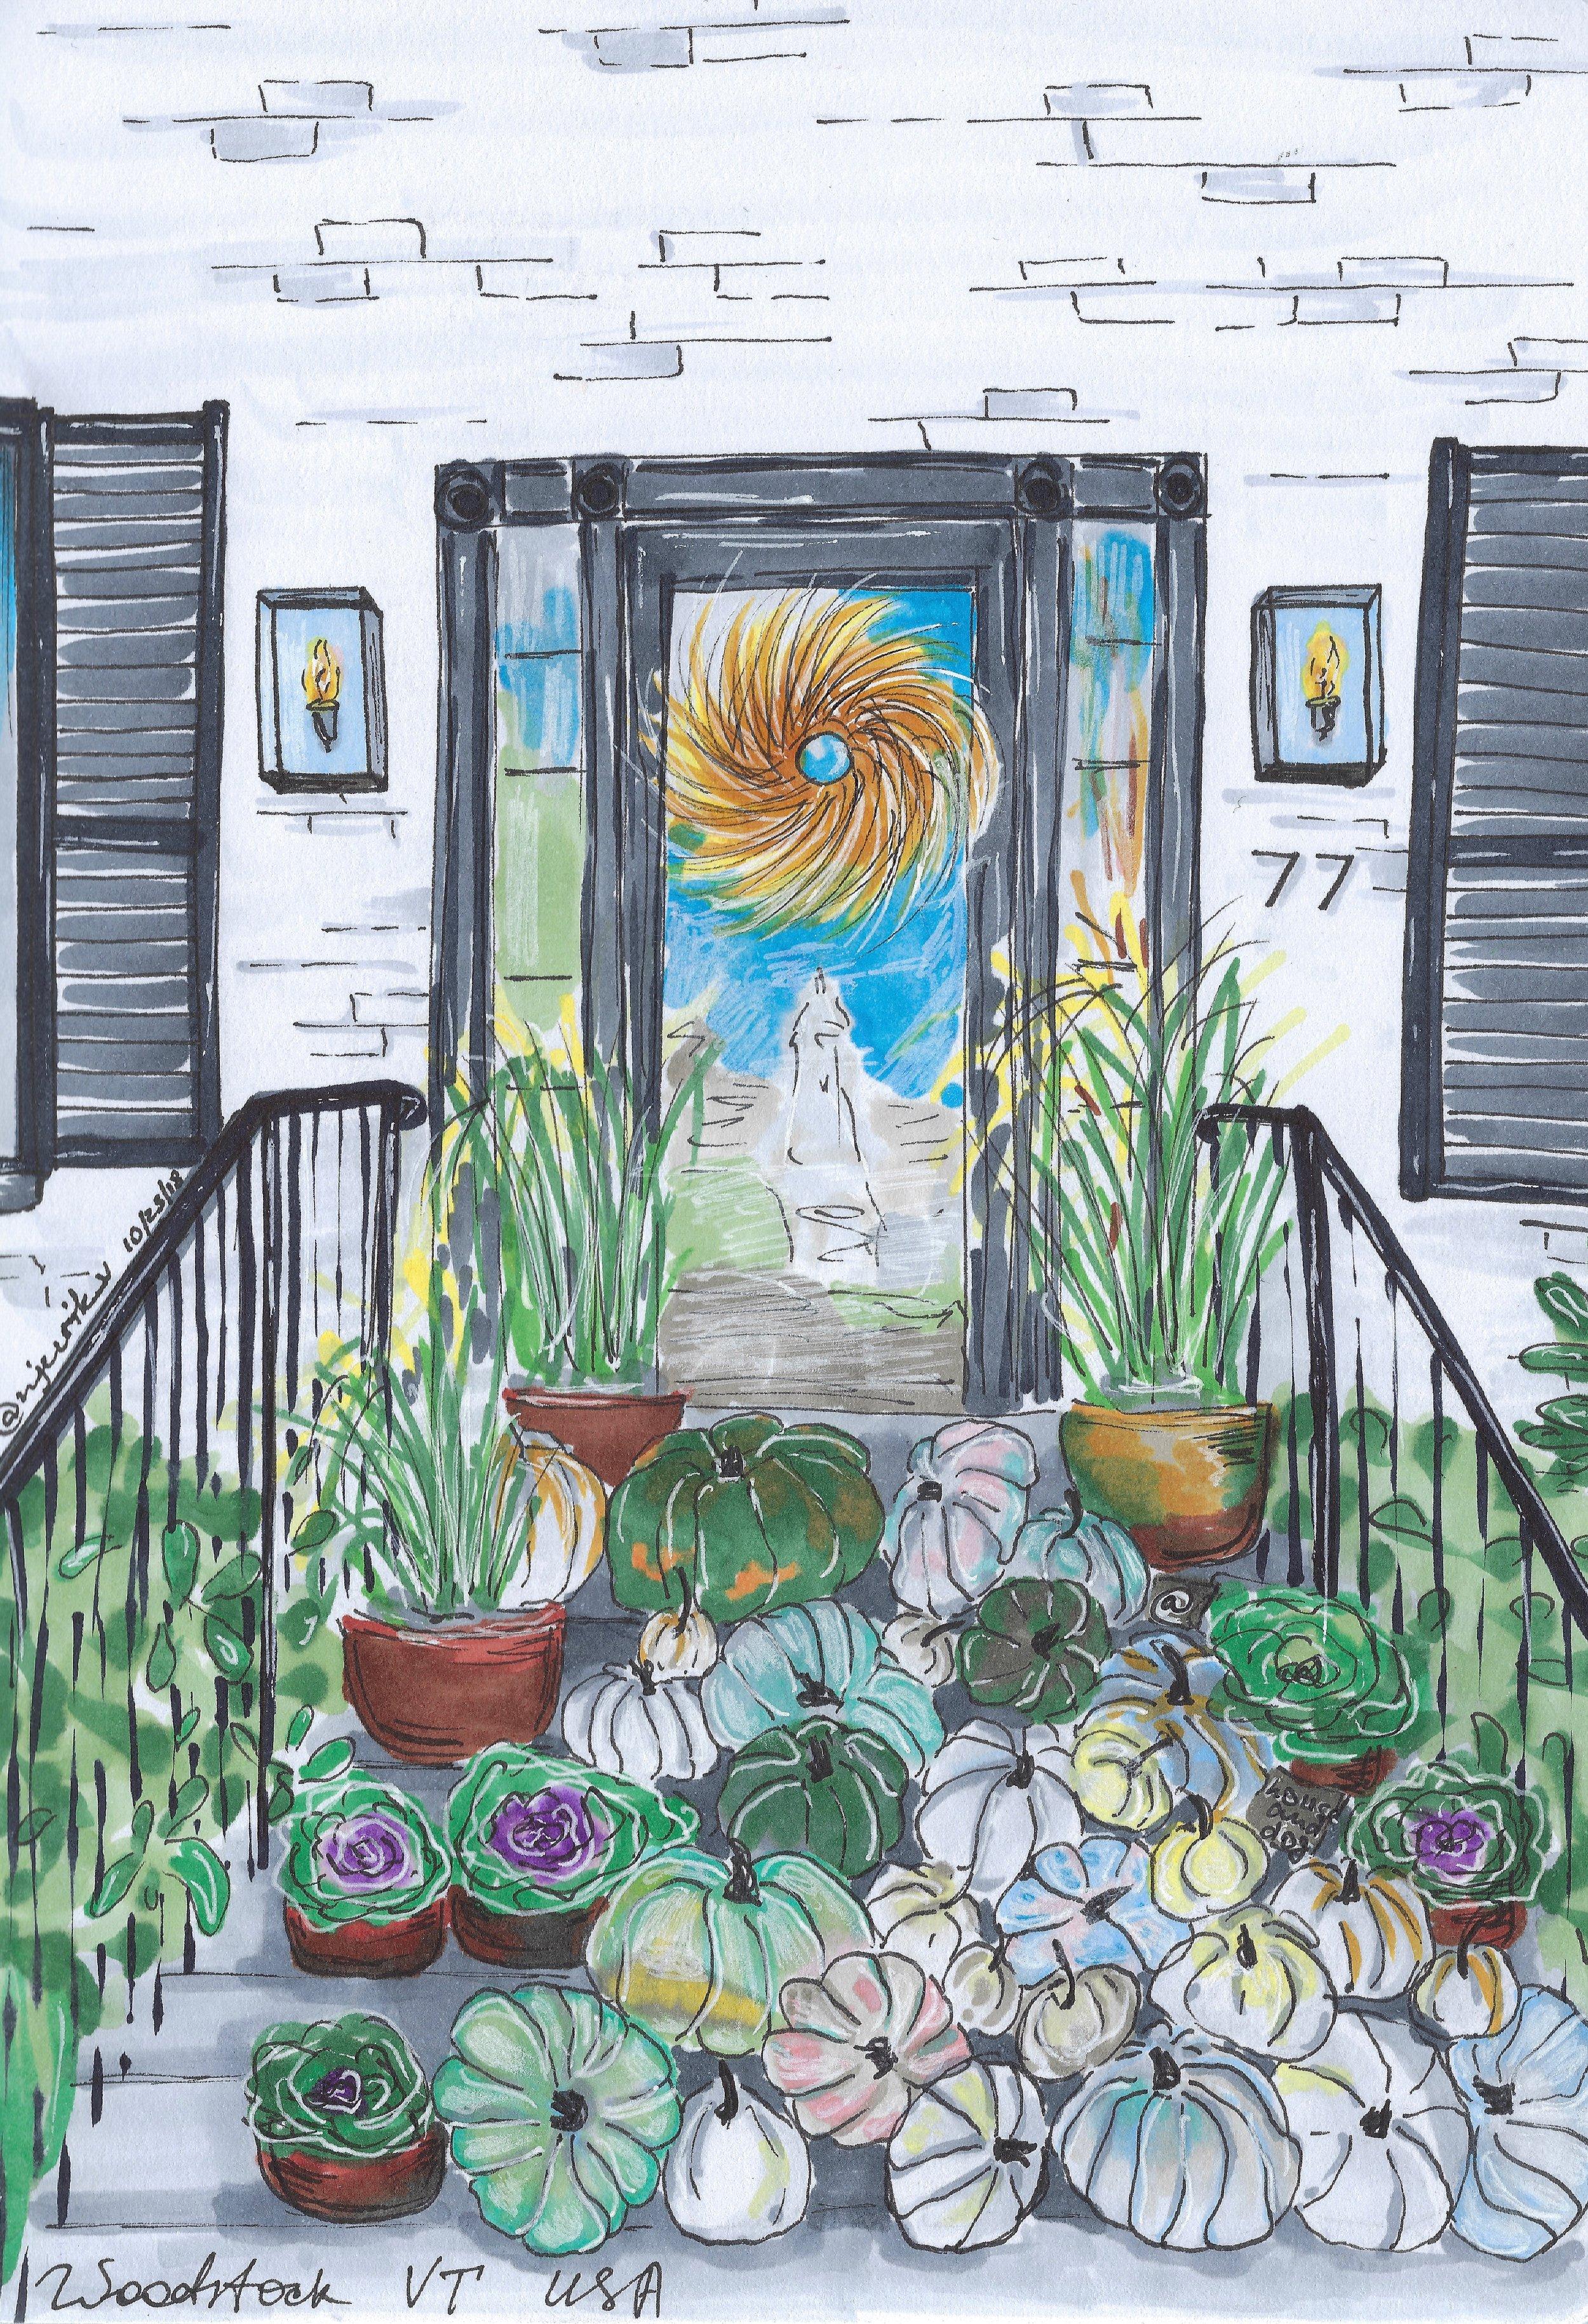 A beautiful drawing of House & Dog by Anna Vaskovska of  @njurik_vaskovska ! Check out her Instagram page!